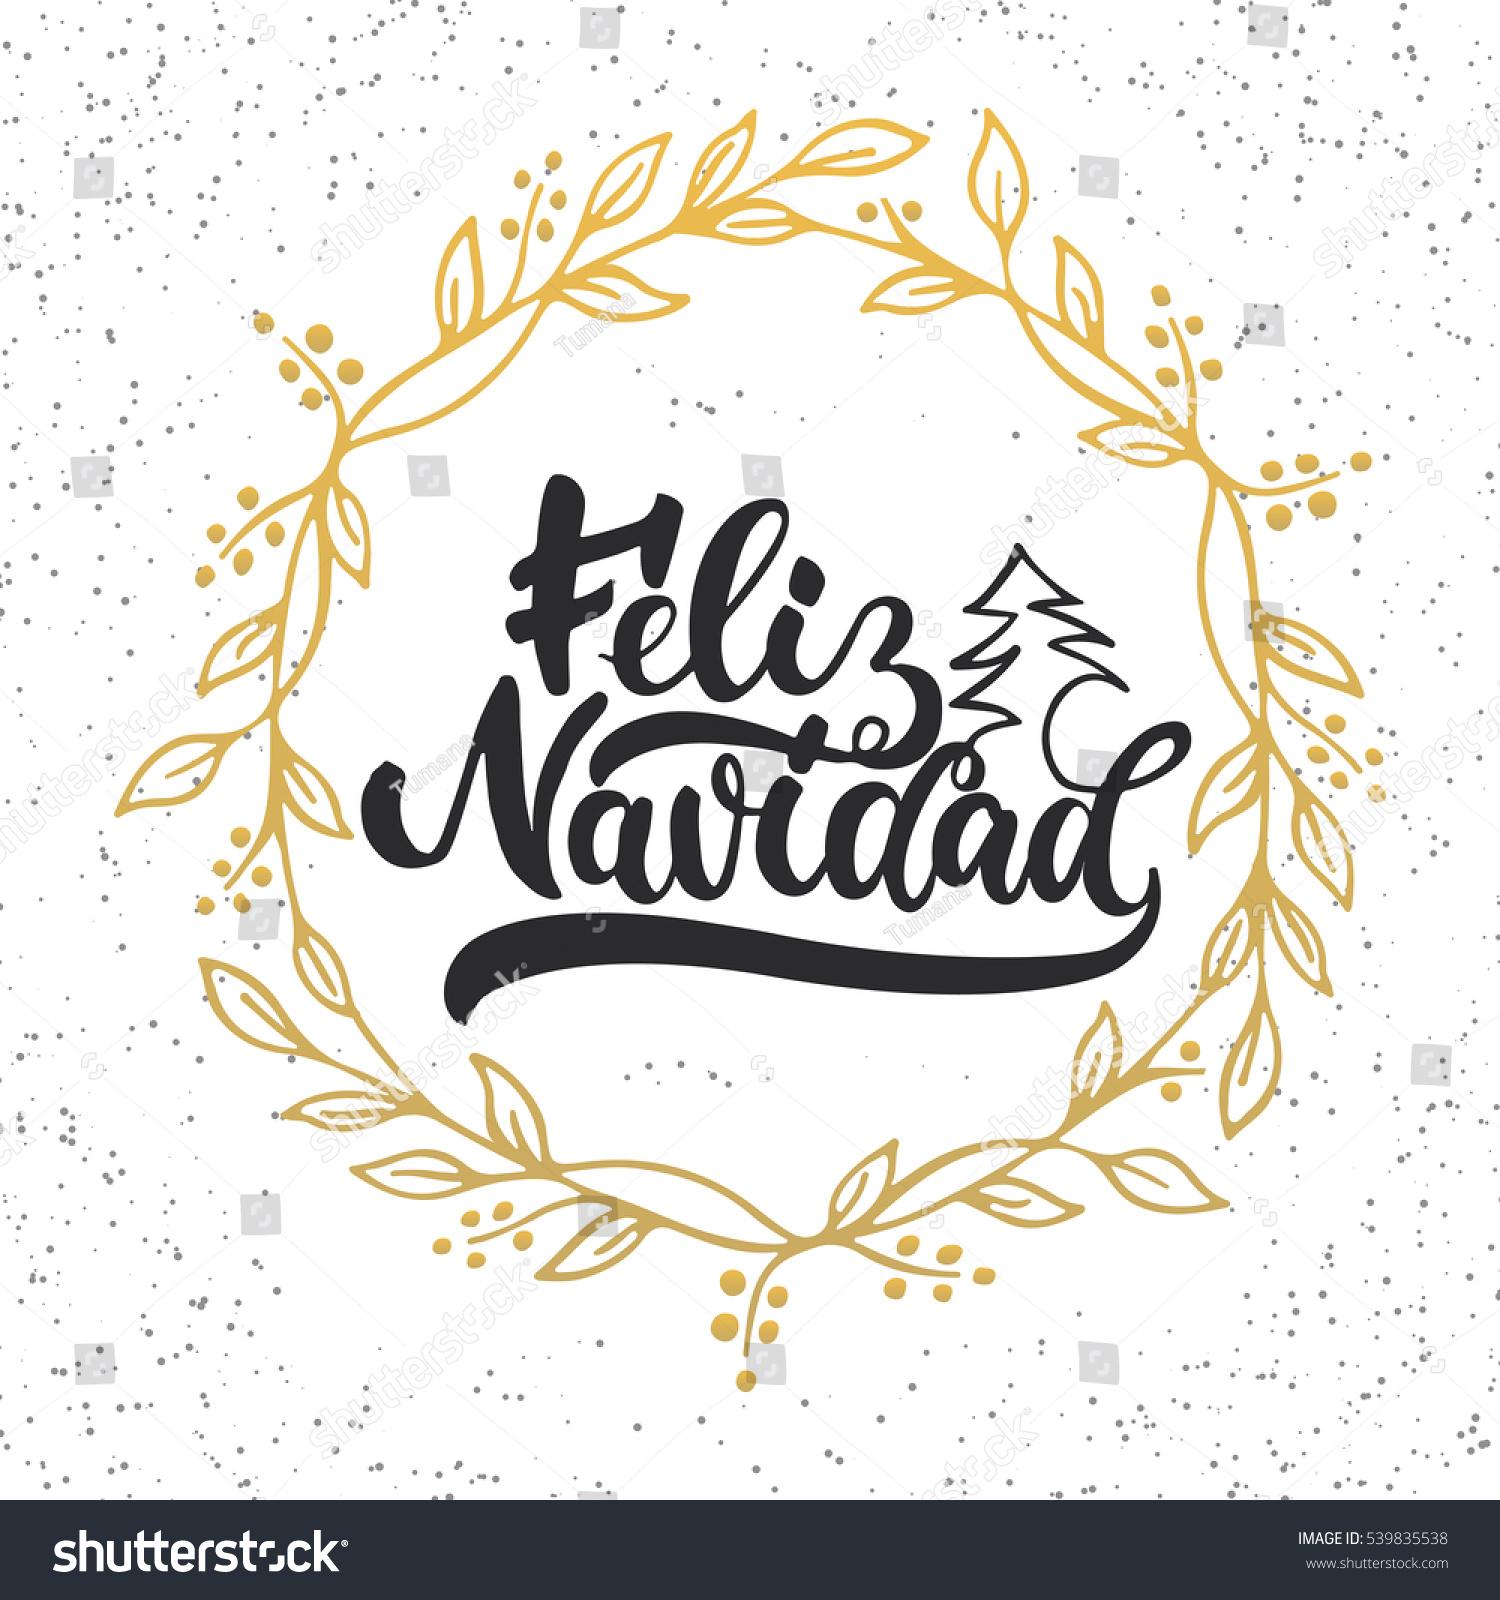 Feliz Navidad Lettering Christmas New Year Stock Vector ...